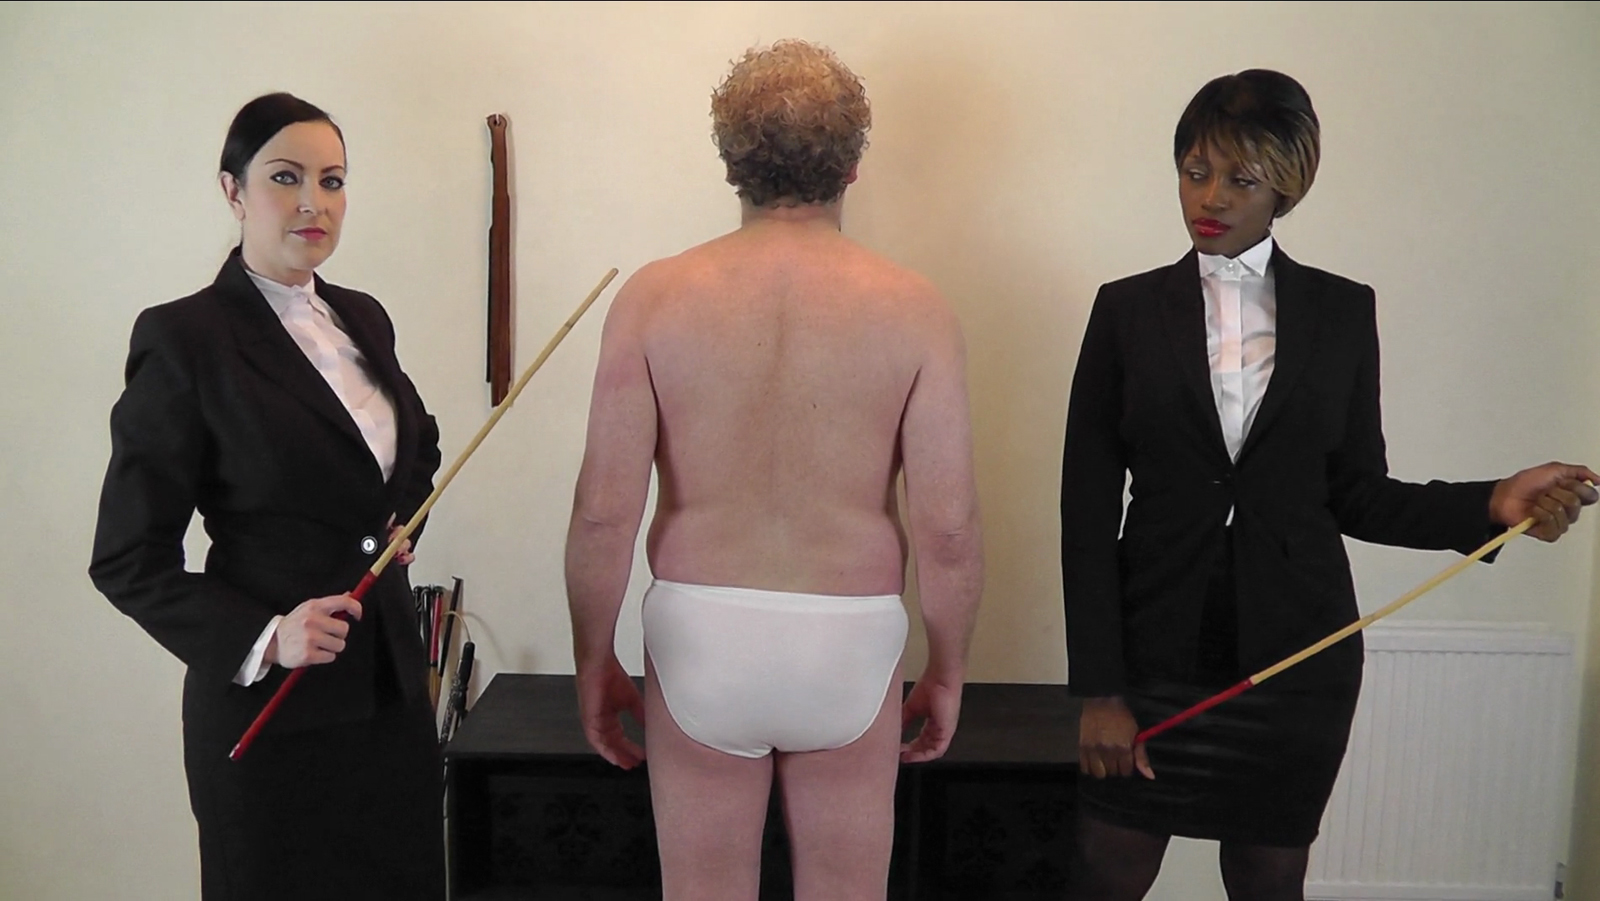 spanked women